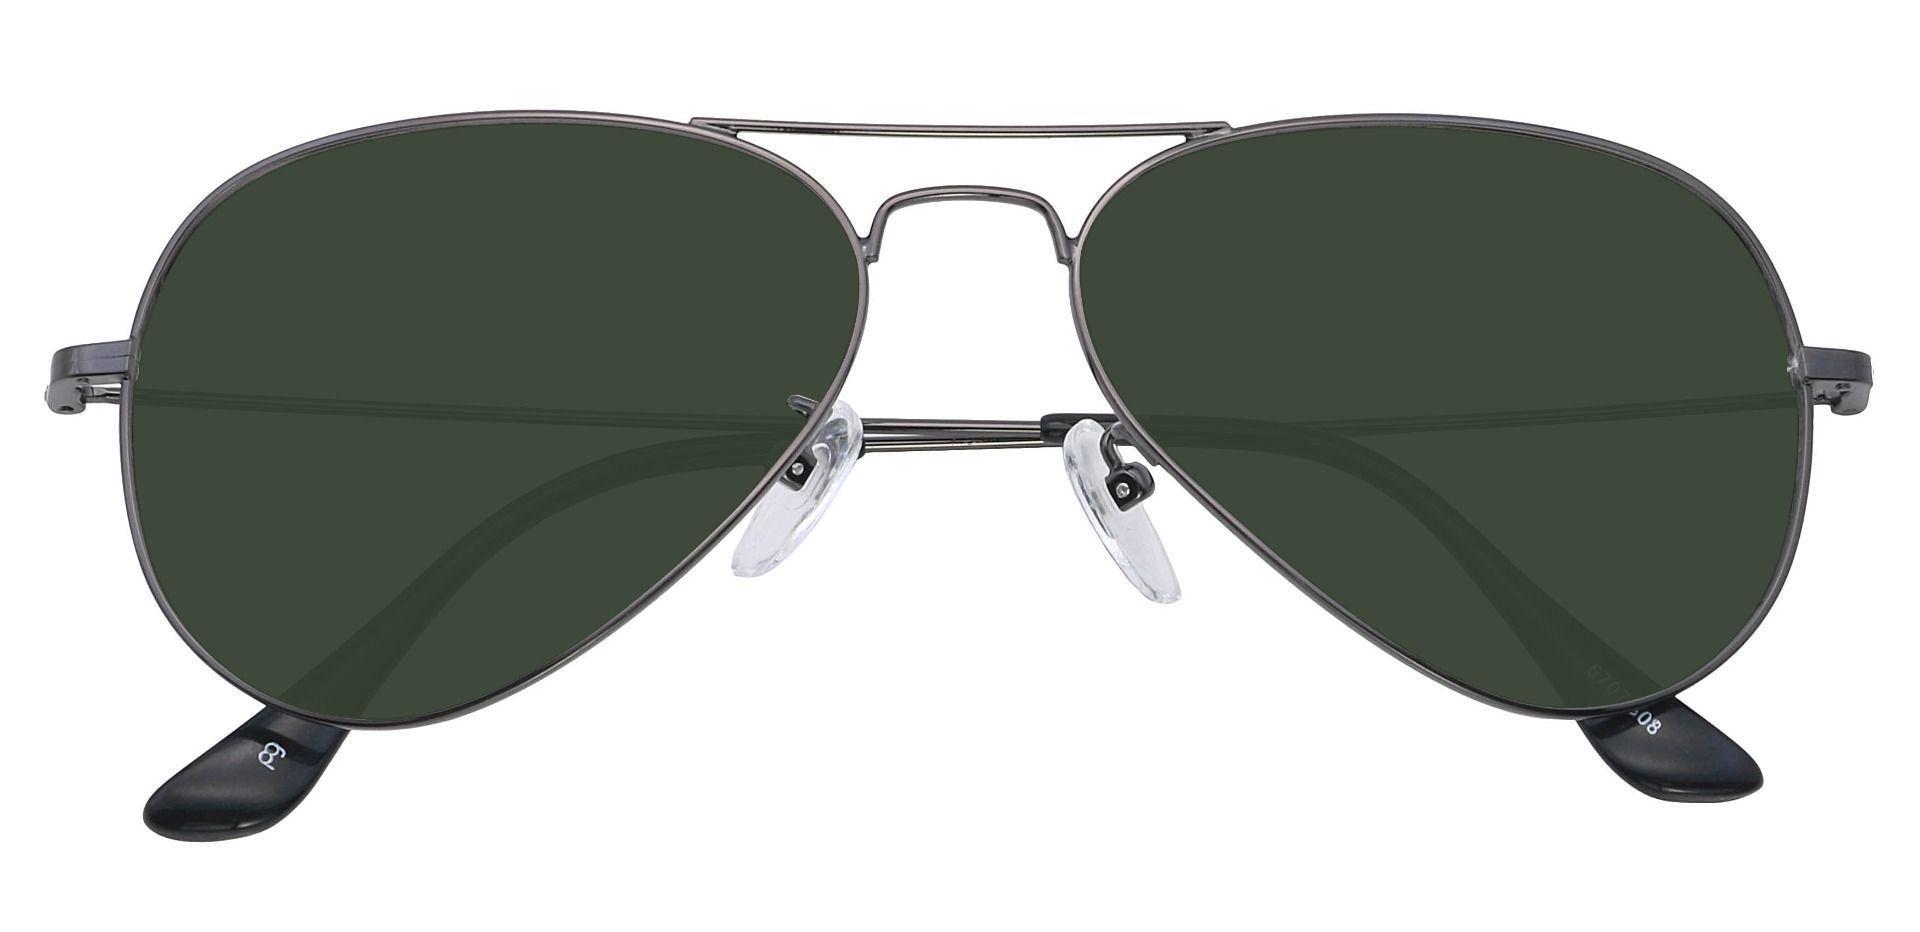 Memphis Aviator Single Vision Sunglasses - Gray Frame With Gray Lenses